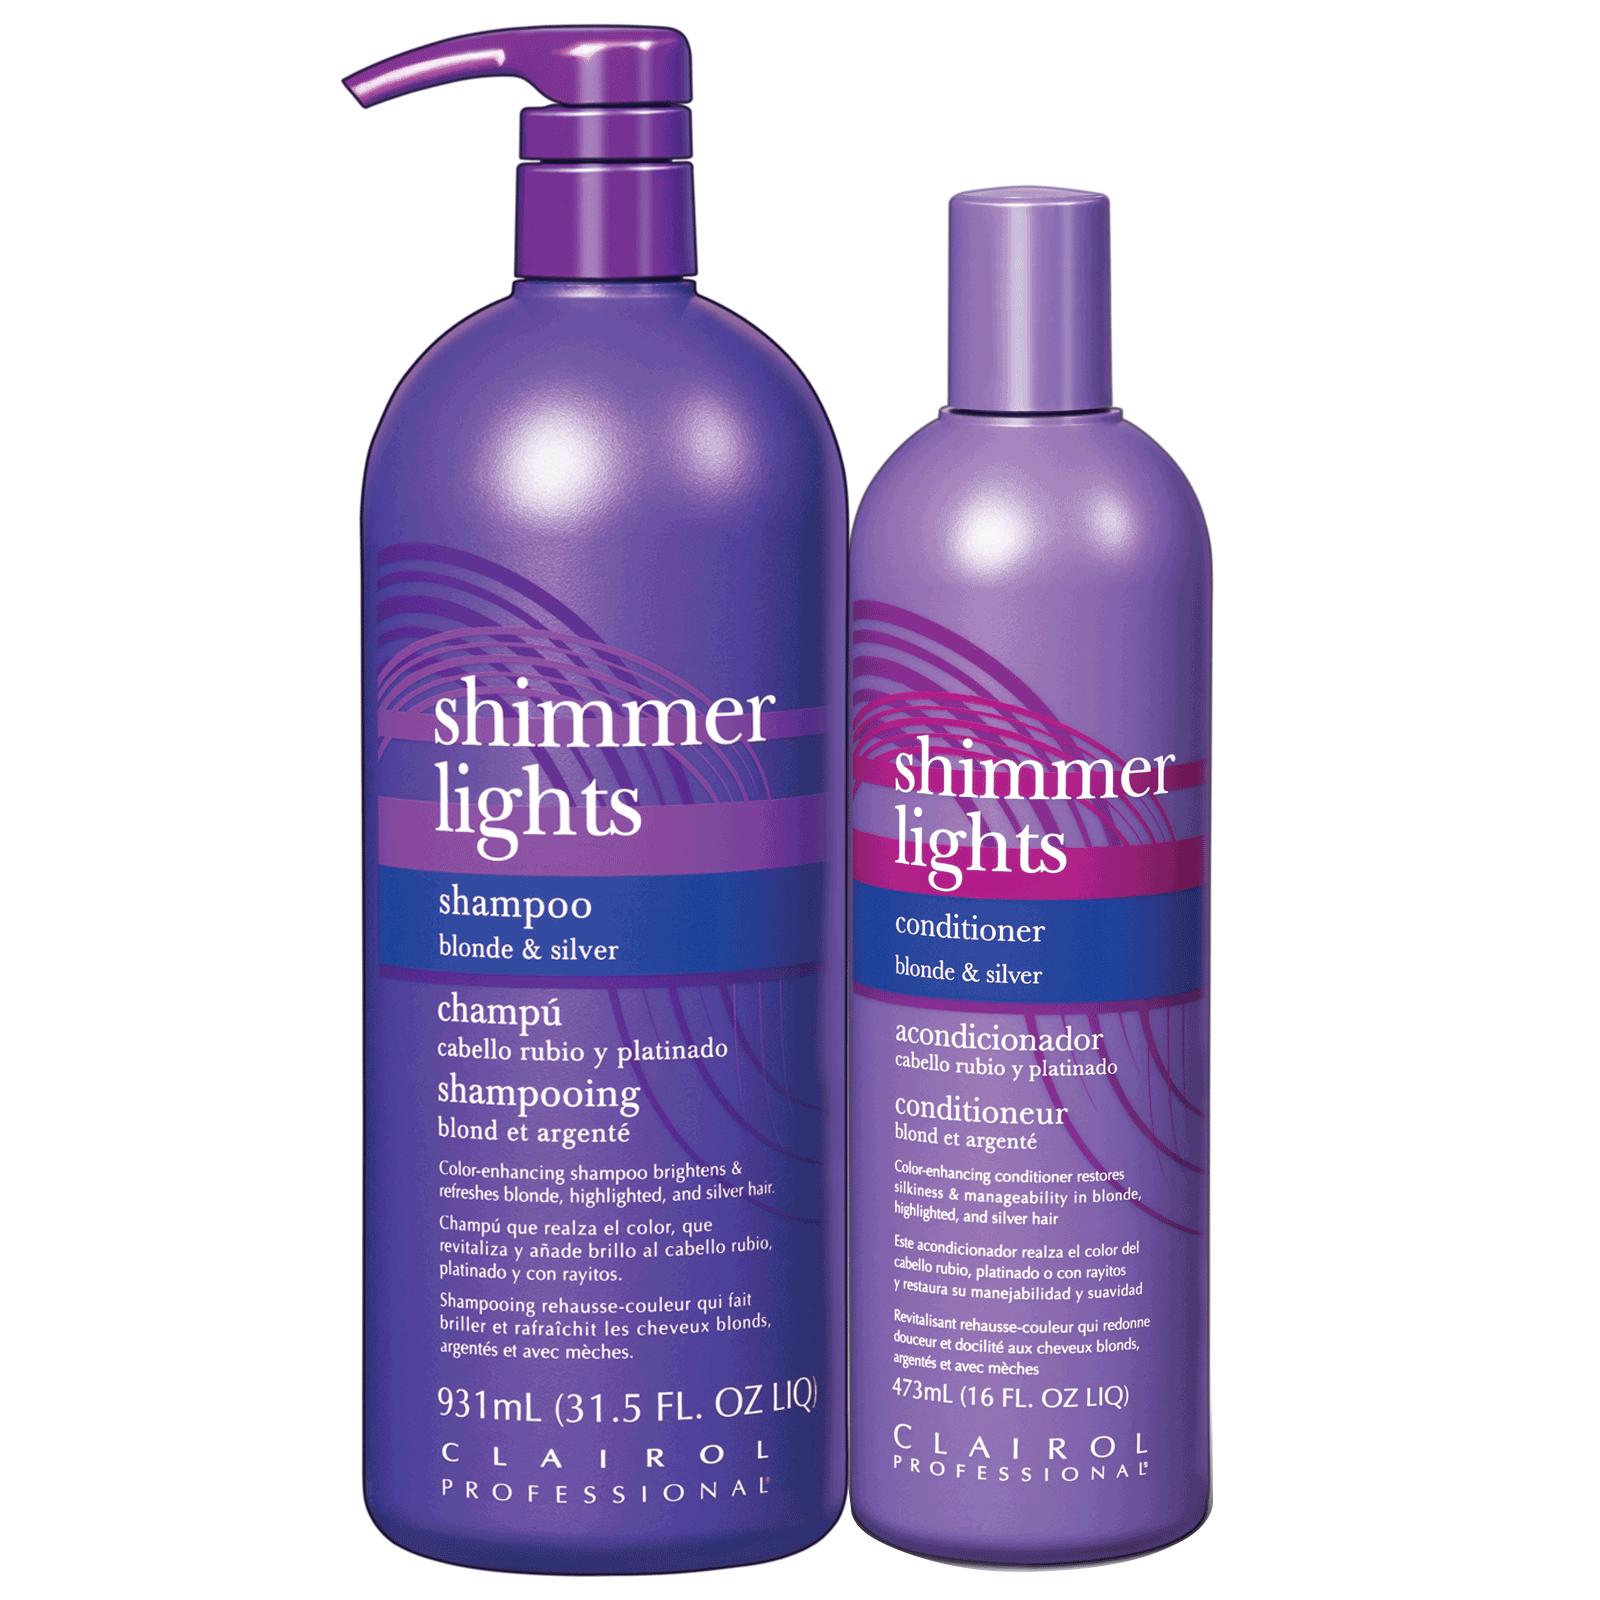 Shimmer Lights Shampoo Amp Conditioner Duo Clairol Cosmoprof